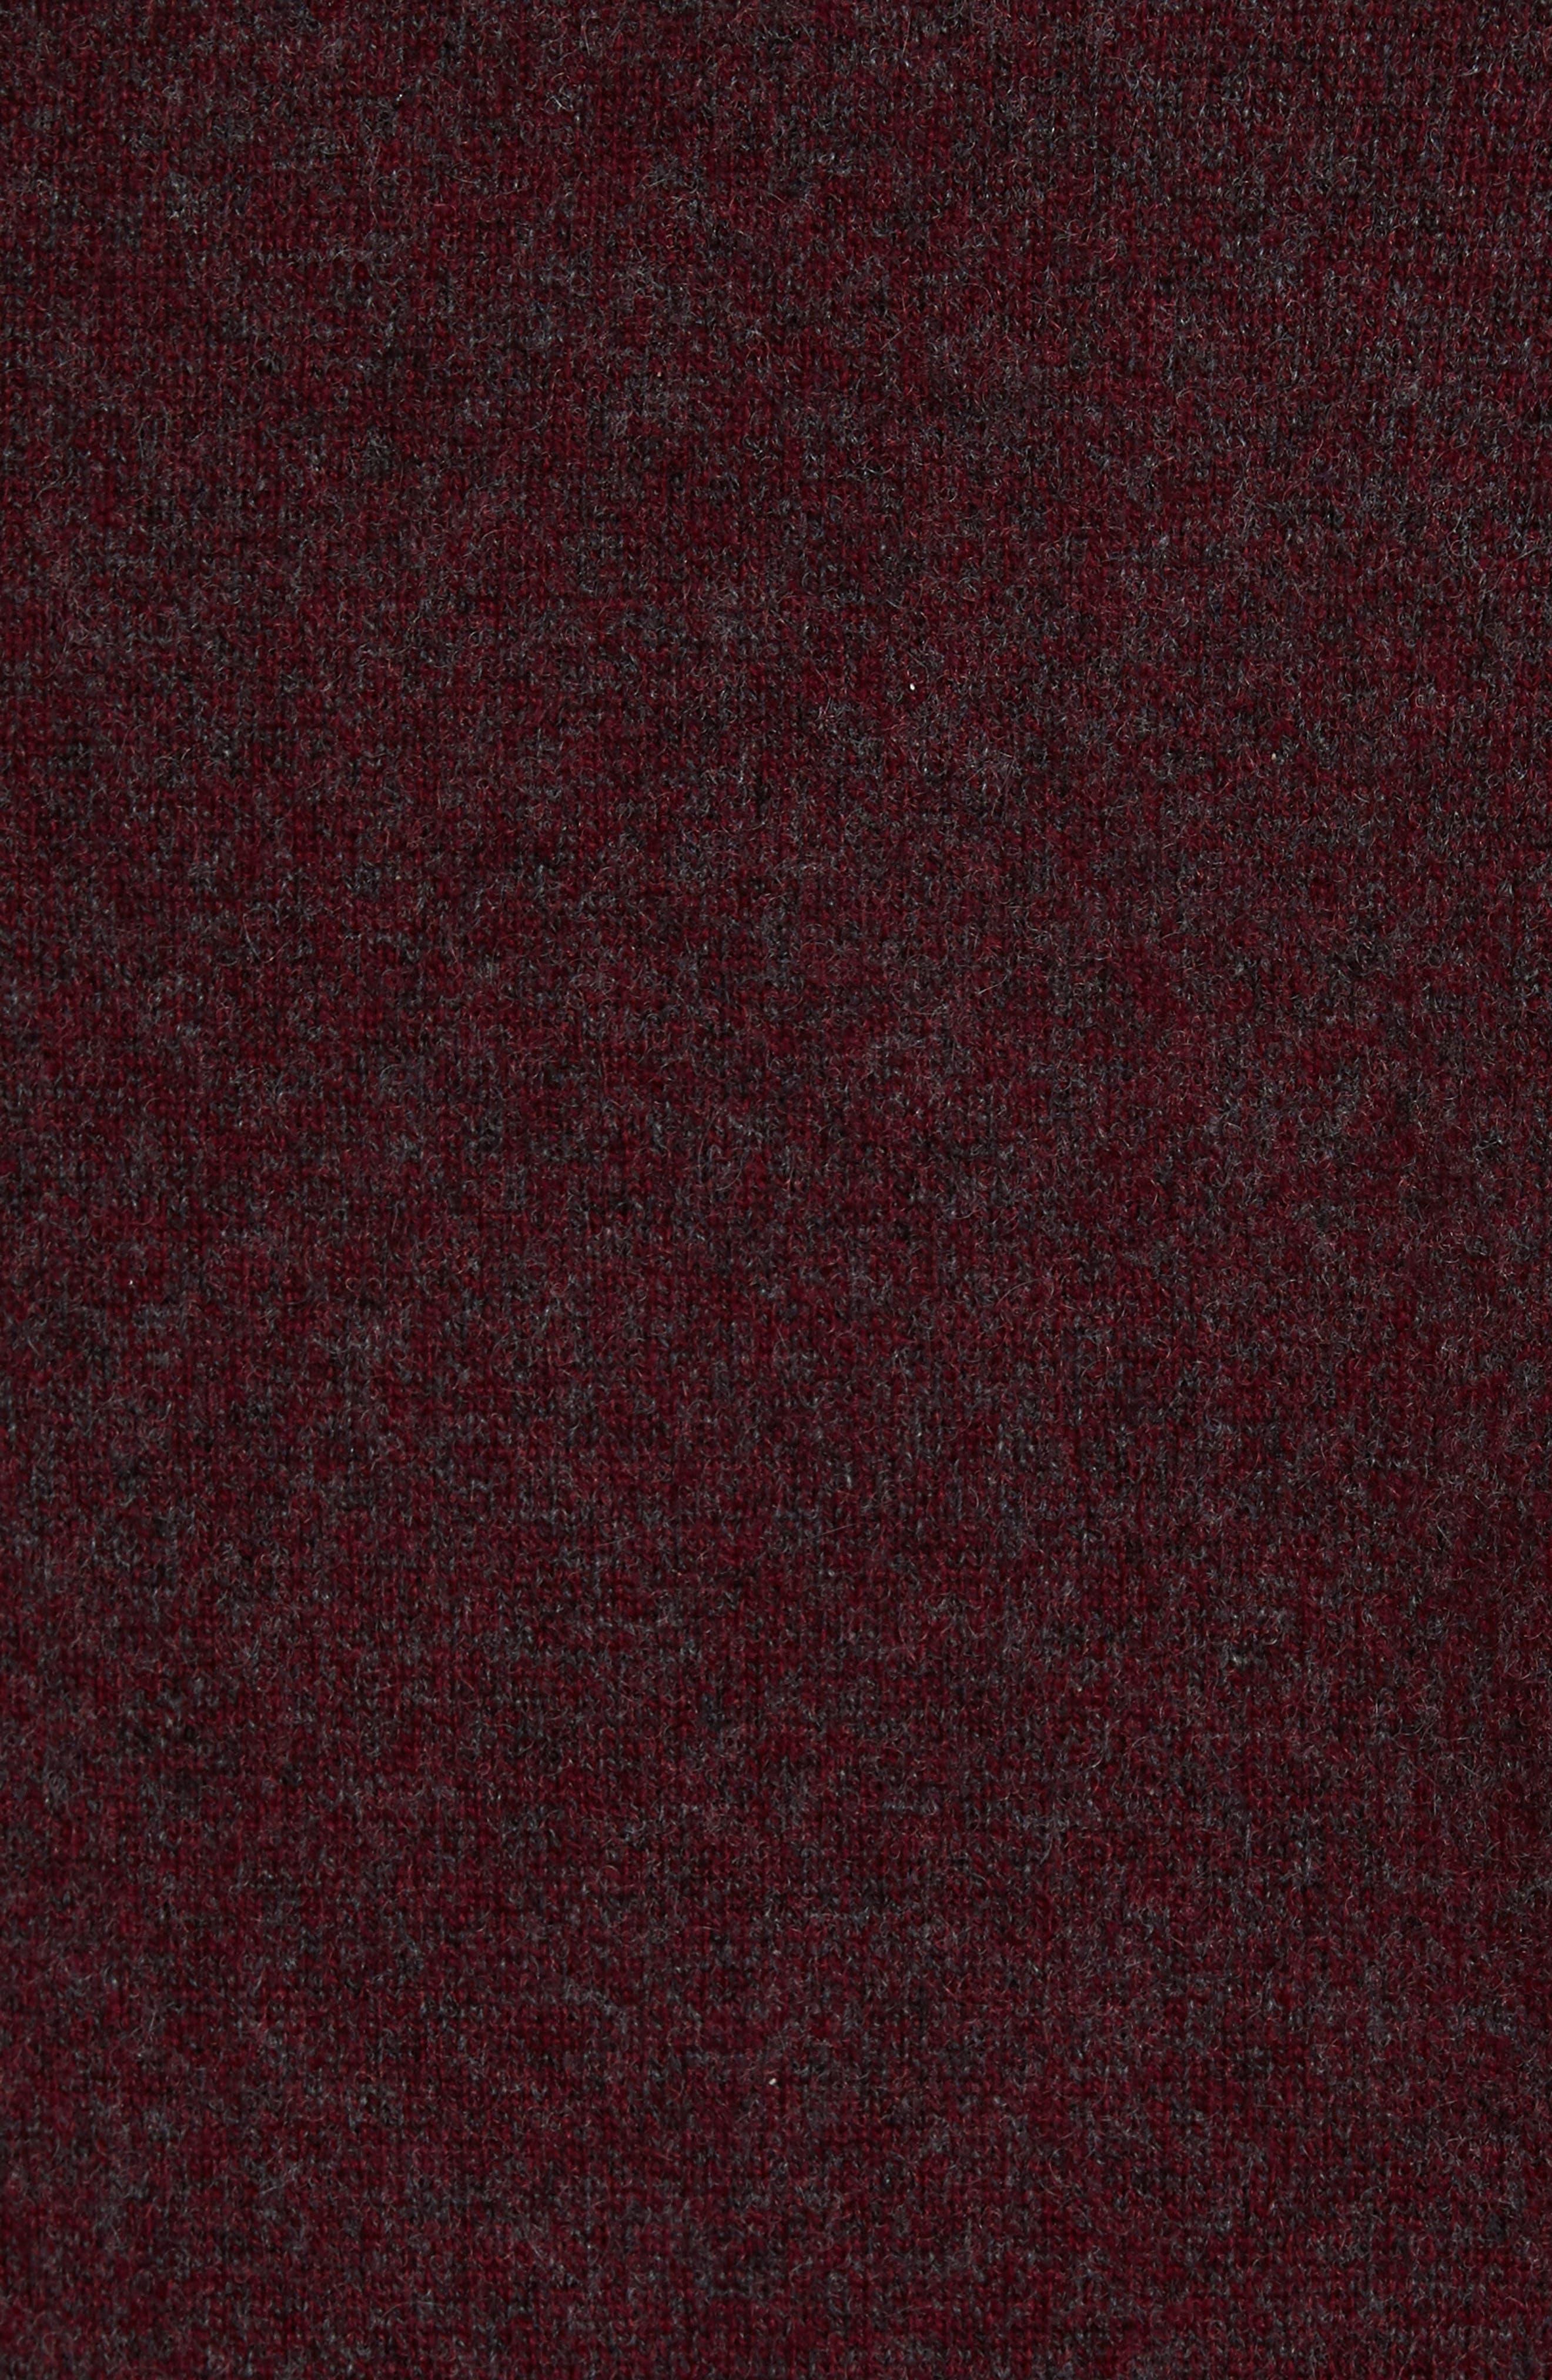 Cashmere V-Neck Sweater,                             Alternate thumbnail 5, color,                             Burgundy Fudge